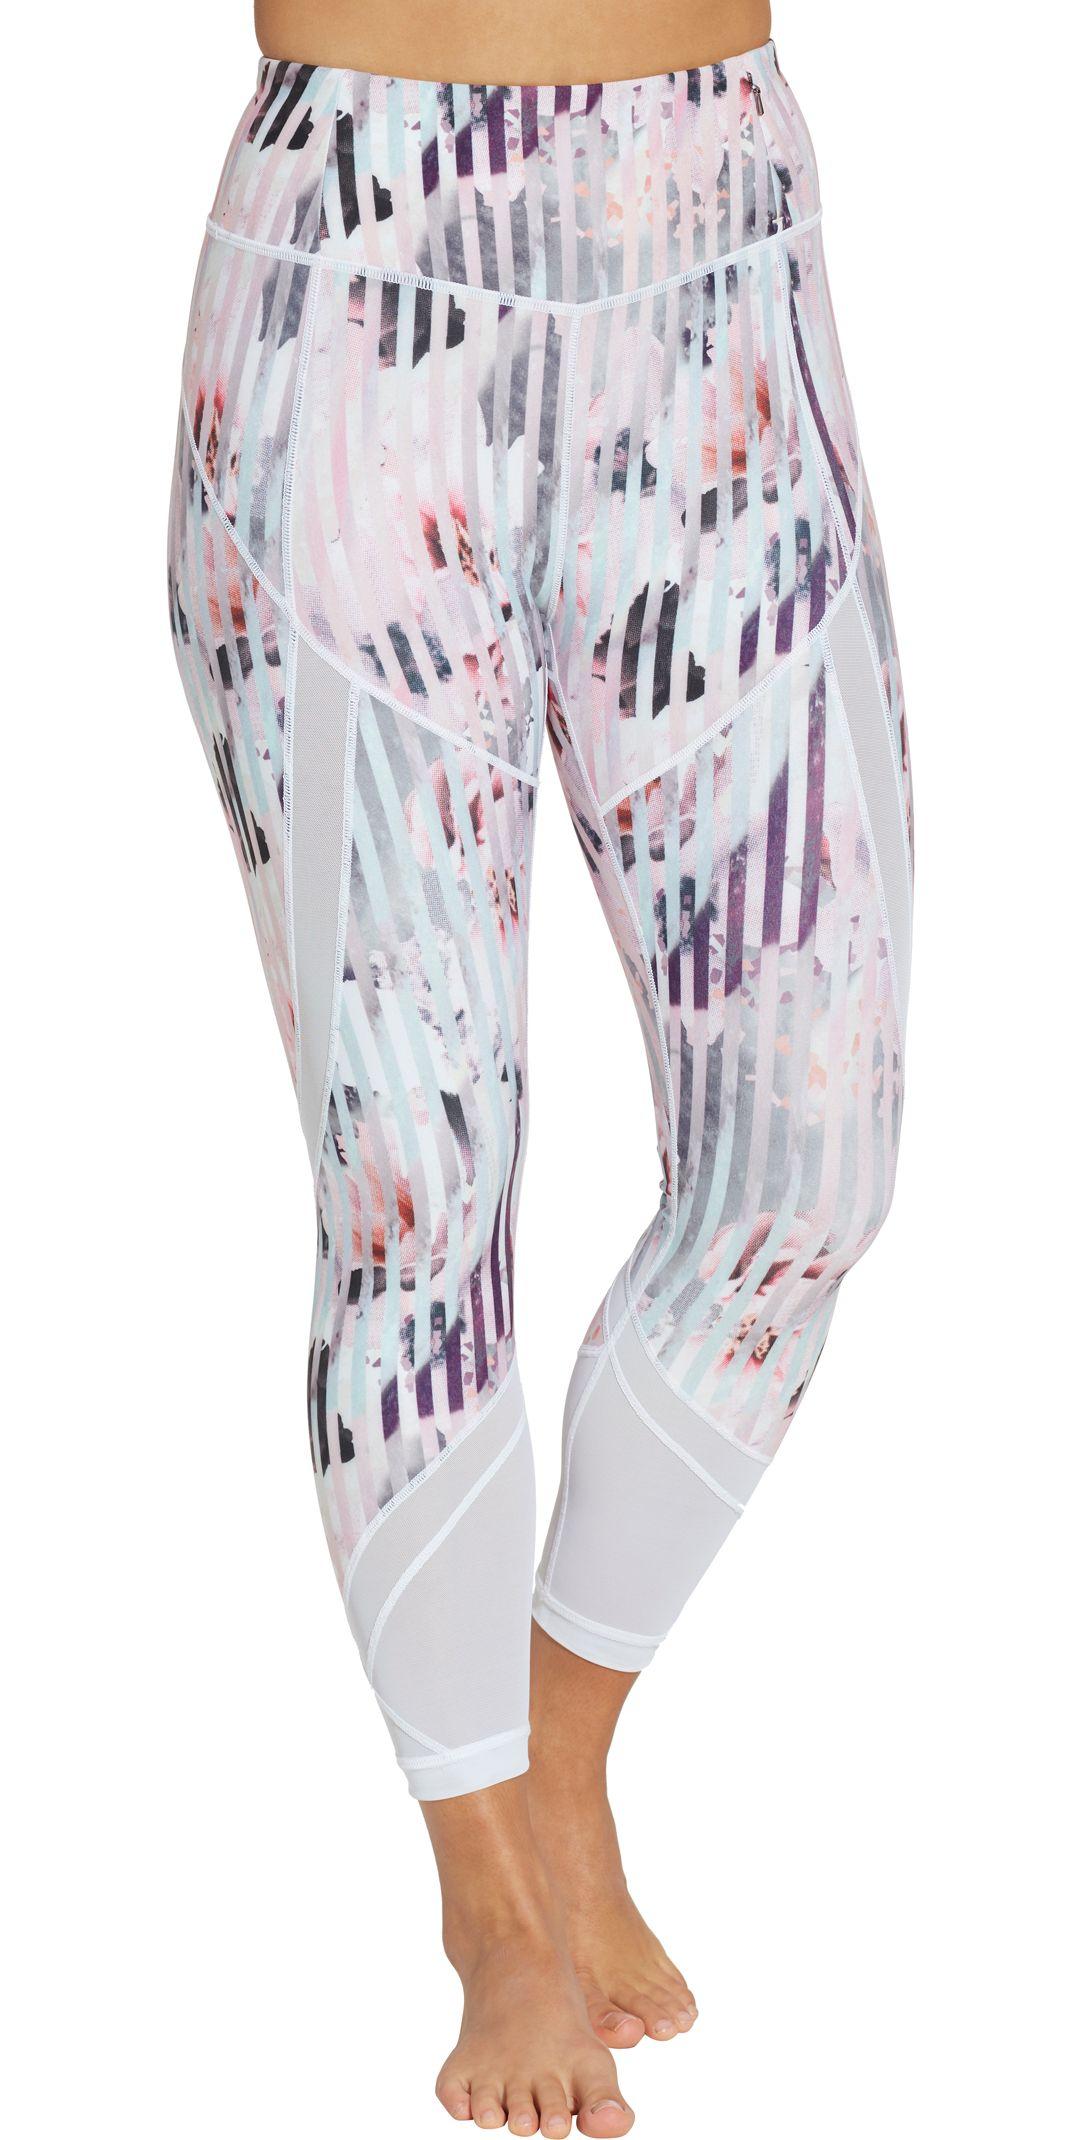 94df2930b74c CALIA by Carrie Underwood Women's Essential Printed Mesh 7/8 Leggings.  noImageFound. Previous. 1